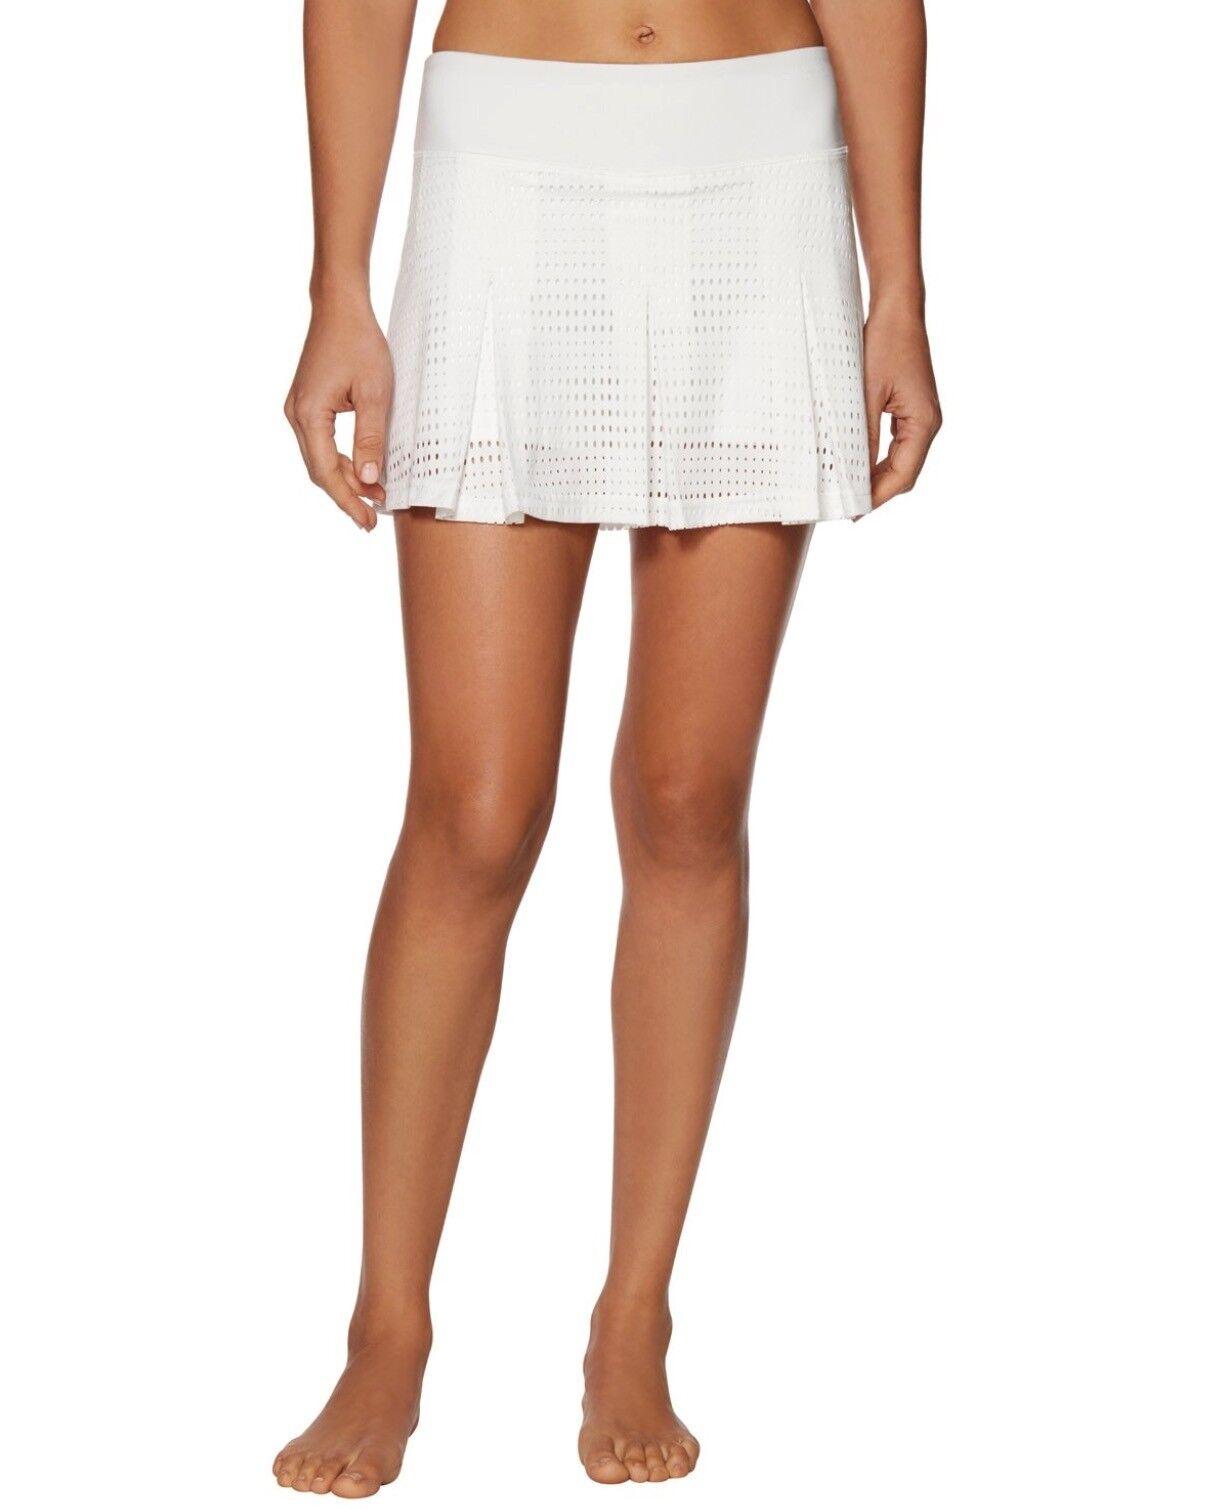 New Shape Tennis Skirt Short Activewear Size S White